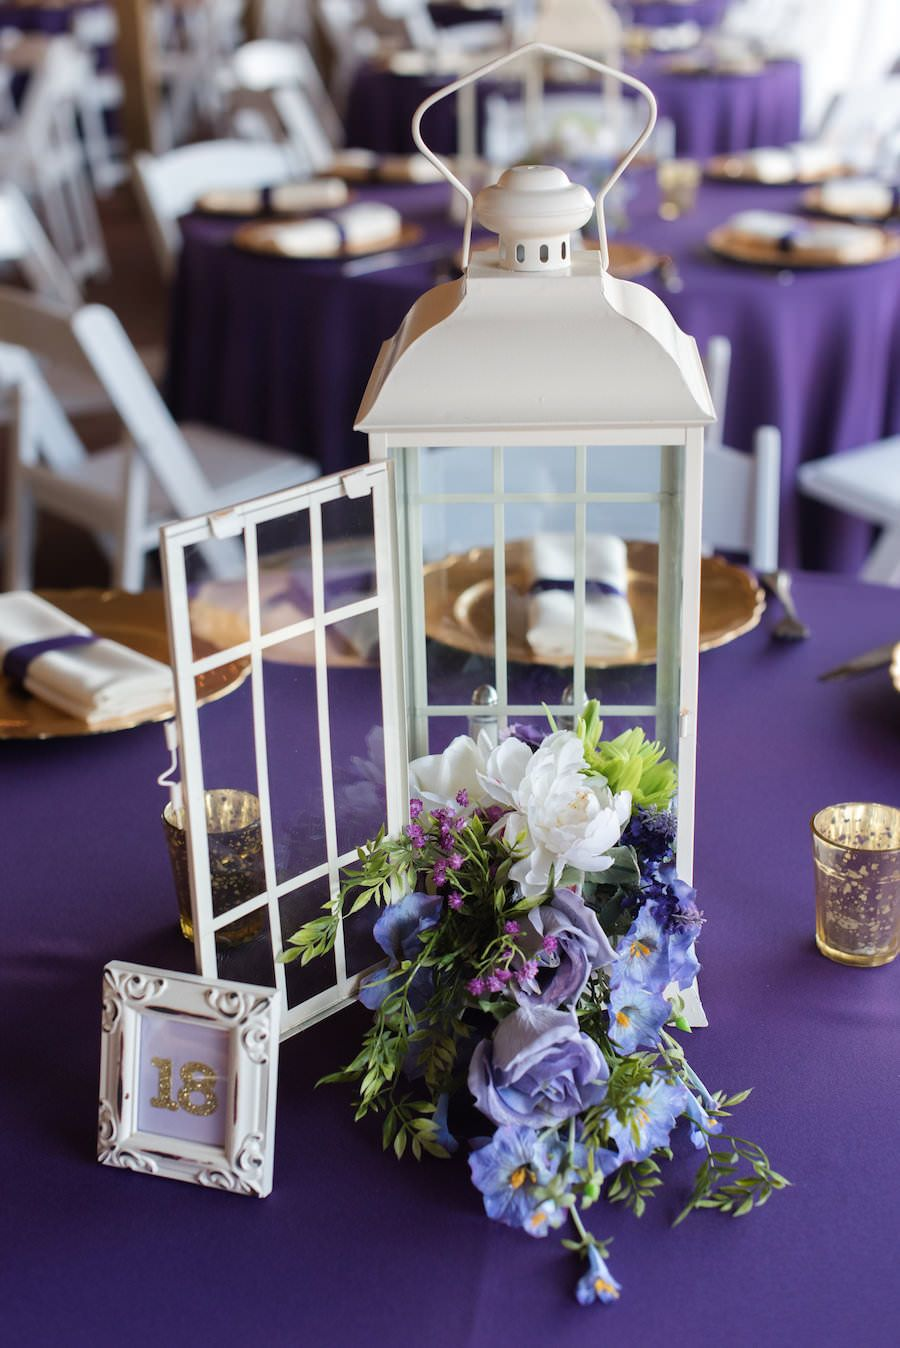 White Lanterns And Floral Centerpieces On Purple Linens Wedding Reception  Table Décor | Rustic Garden Wedding